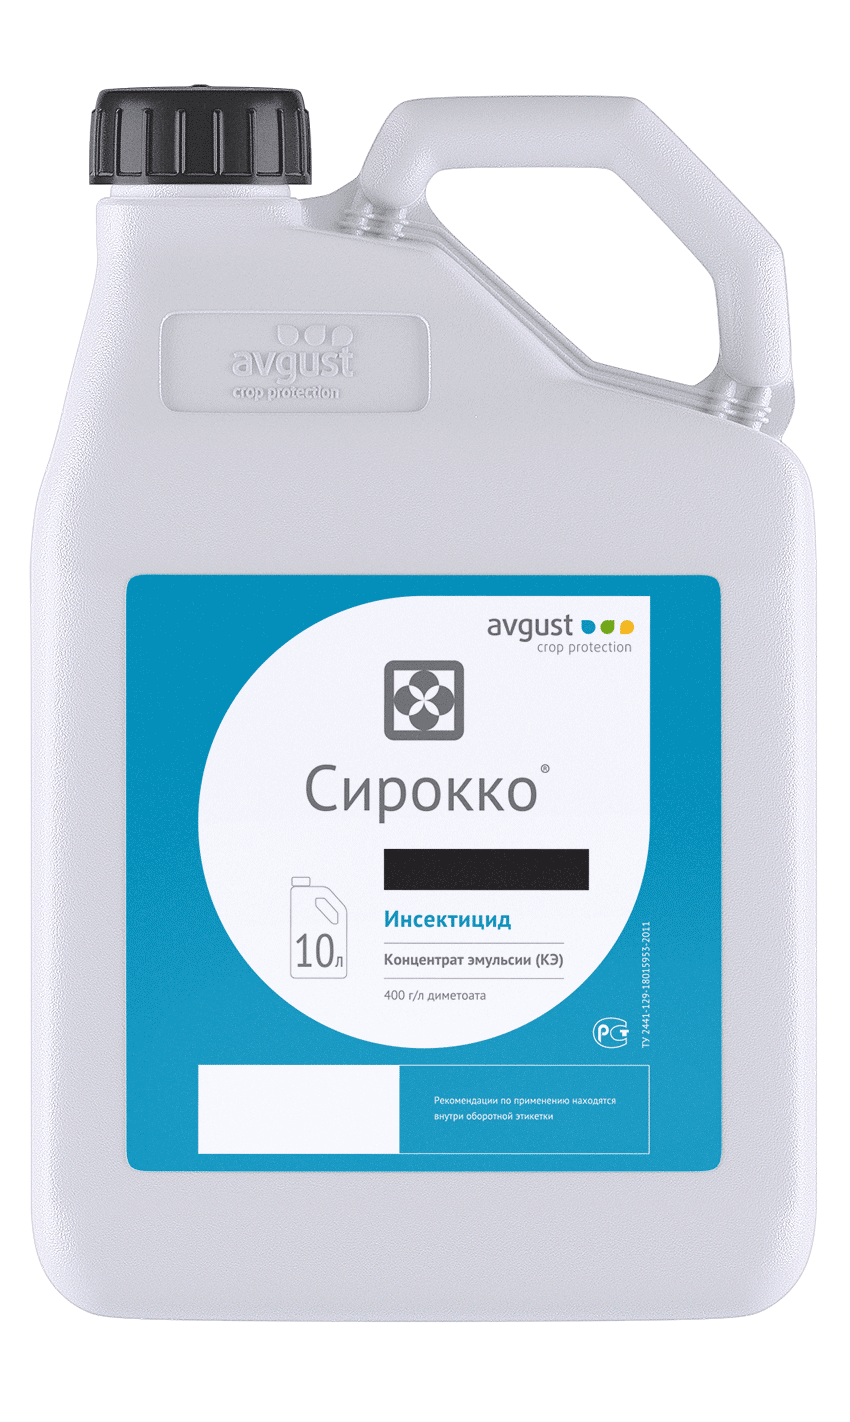 Сирокко, КЭ инсектицид диметоат